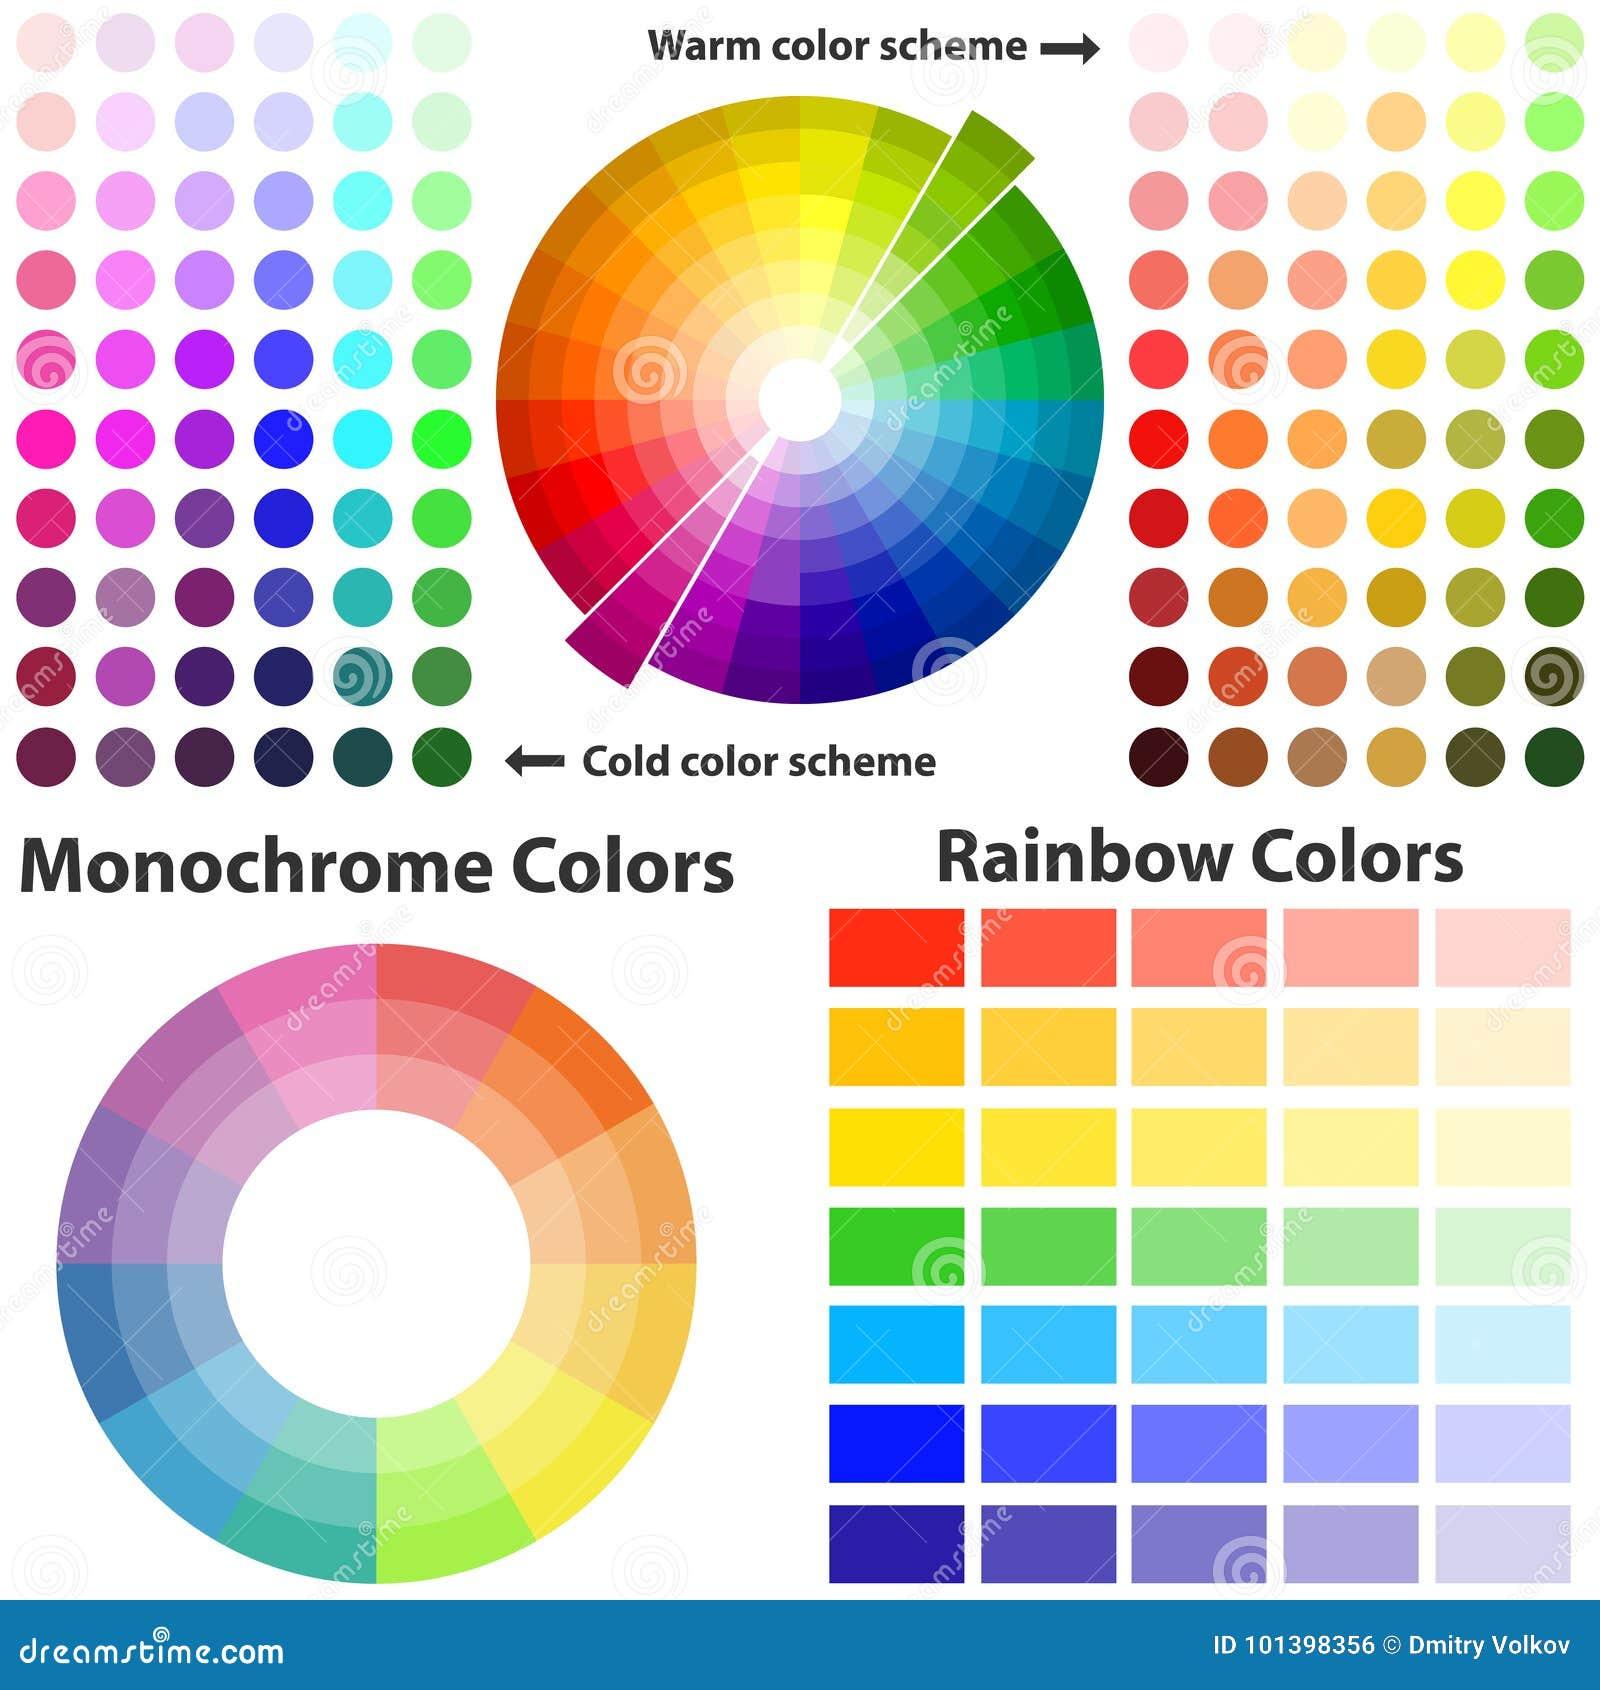 Cores do esquema de cores, as mornas e as frias